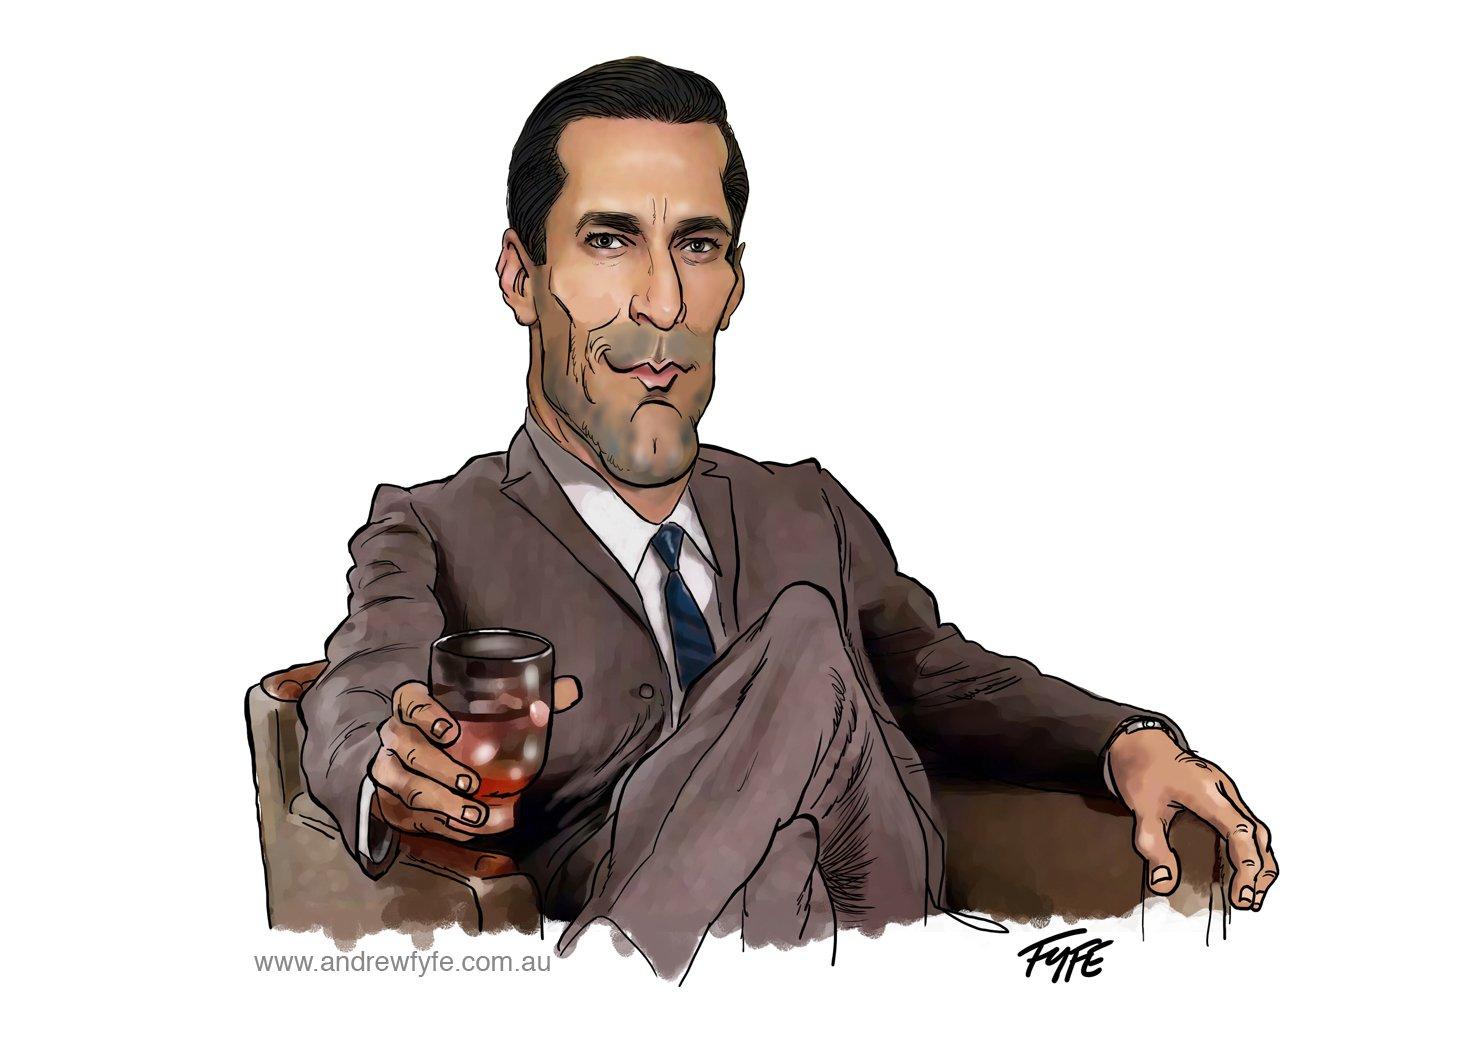 Don Draper, Don Draper caricature, caricatures